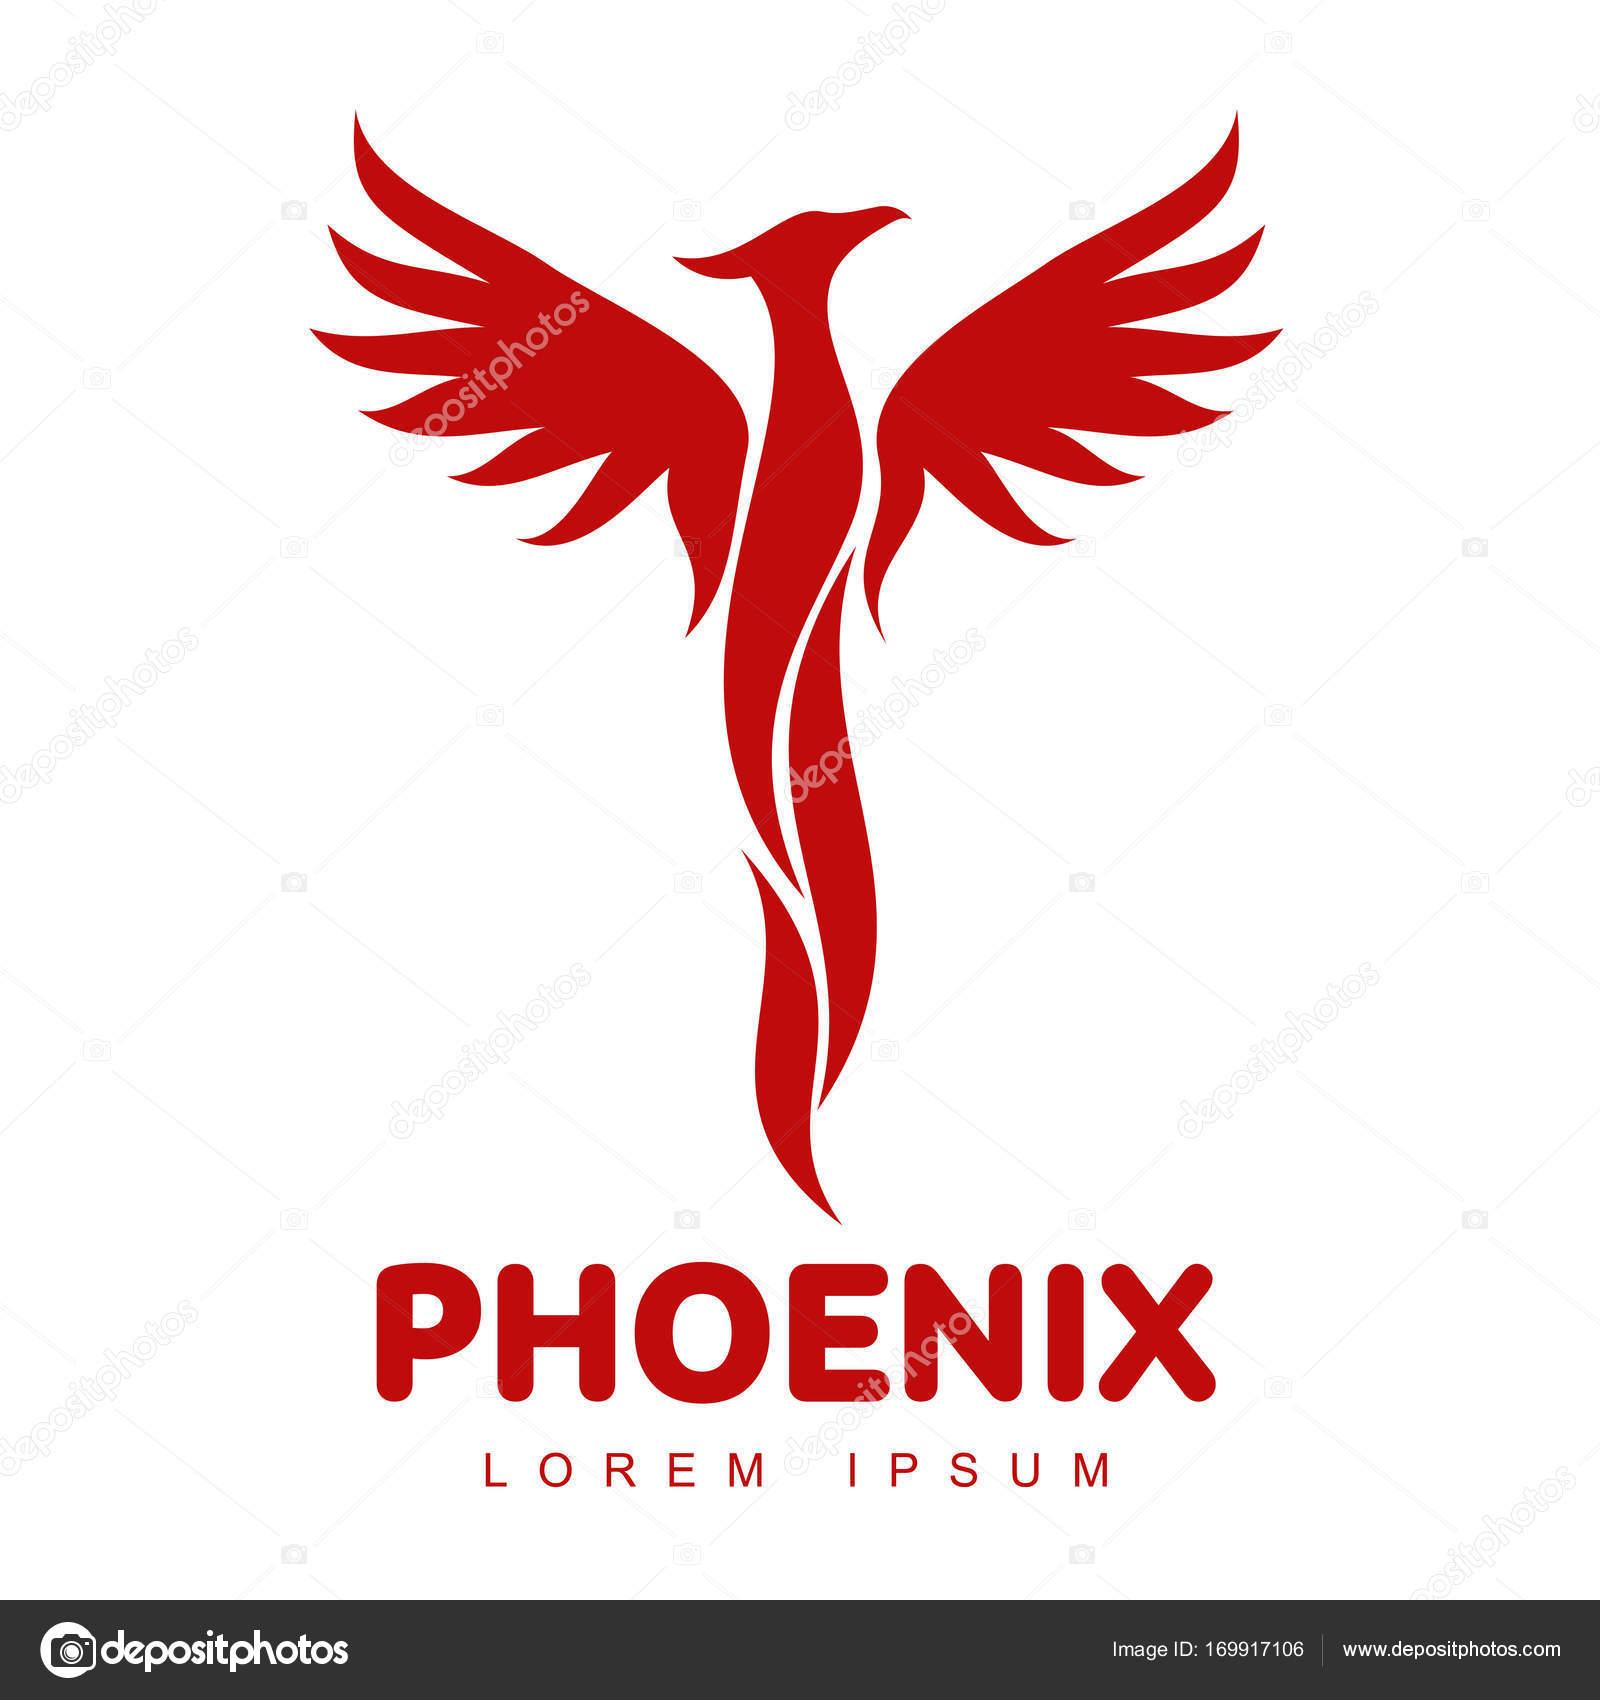 Áˆ Logo Falcon Stock Pictures Royalty Free Phoenix Bird Logo Images Download On Depositphotos